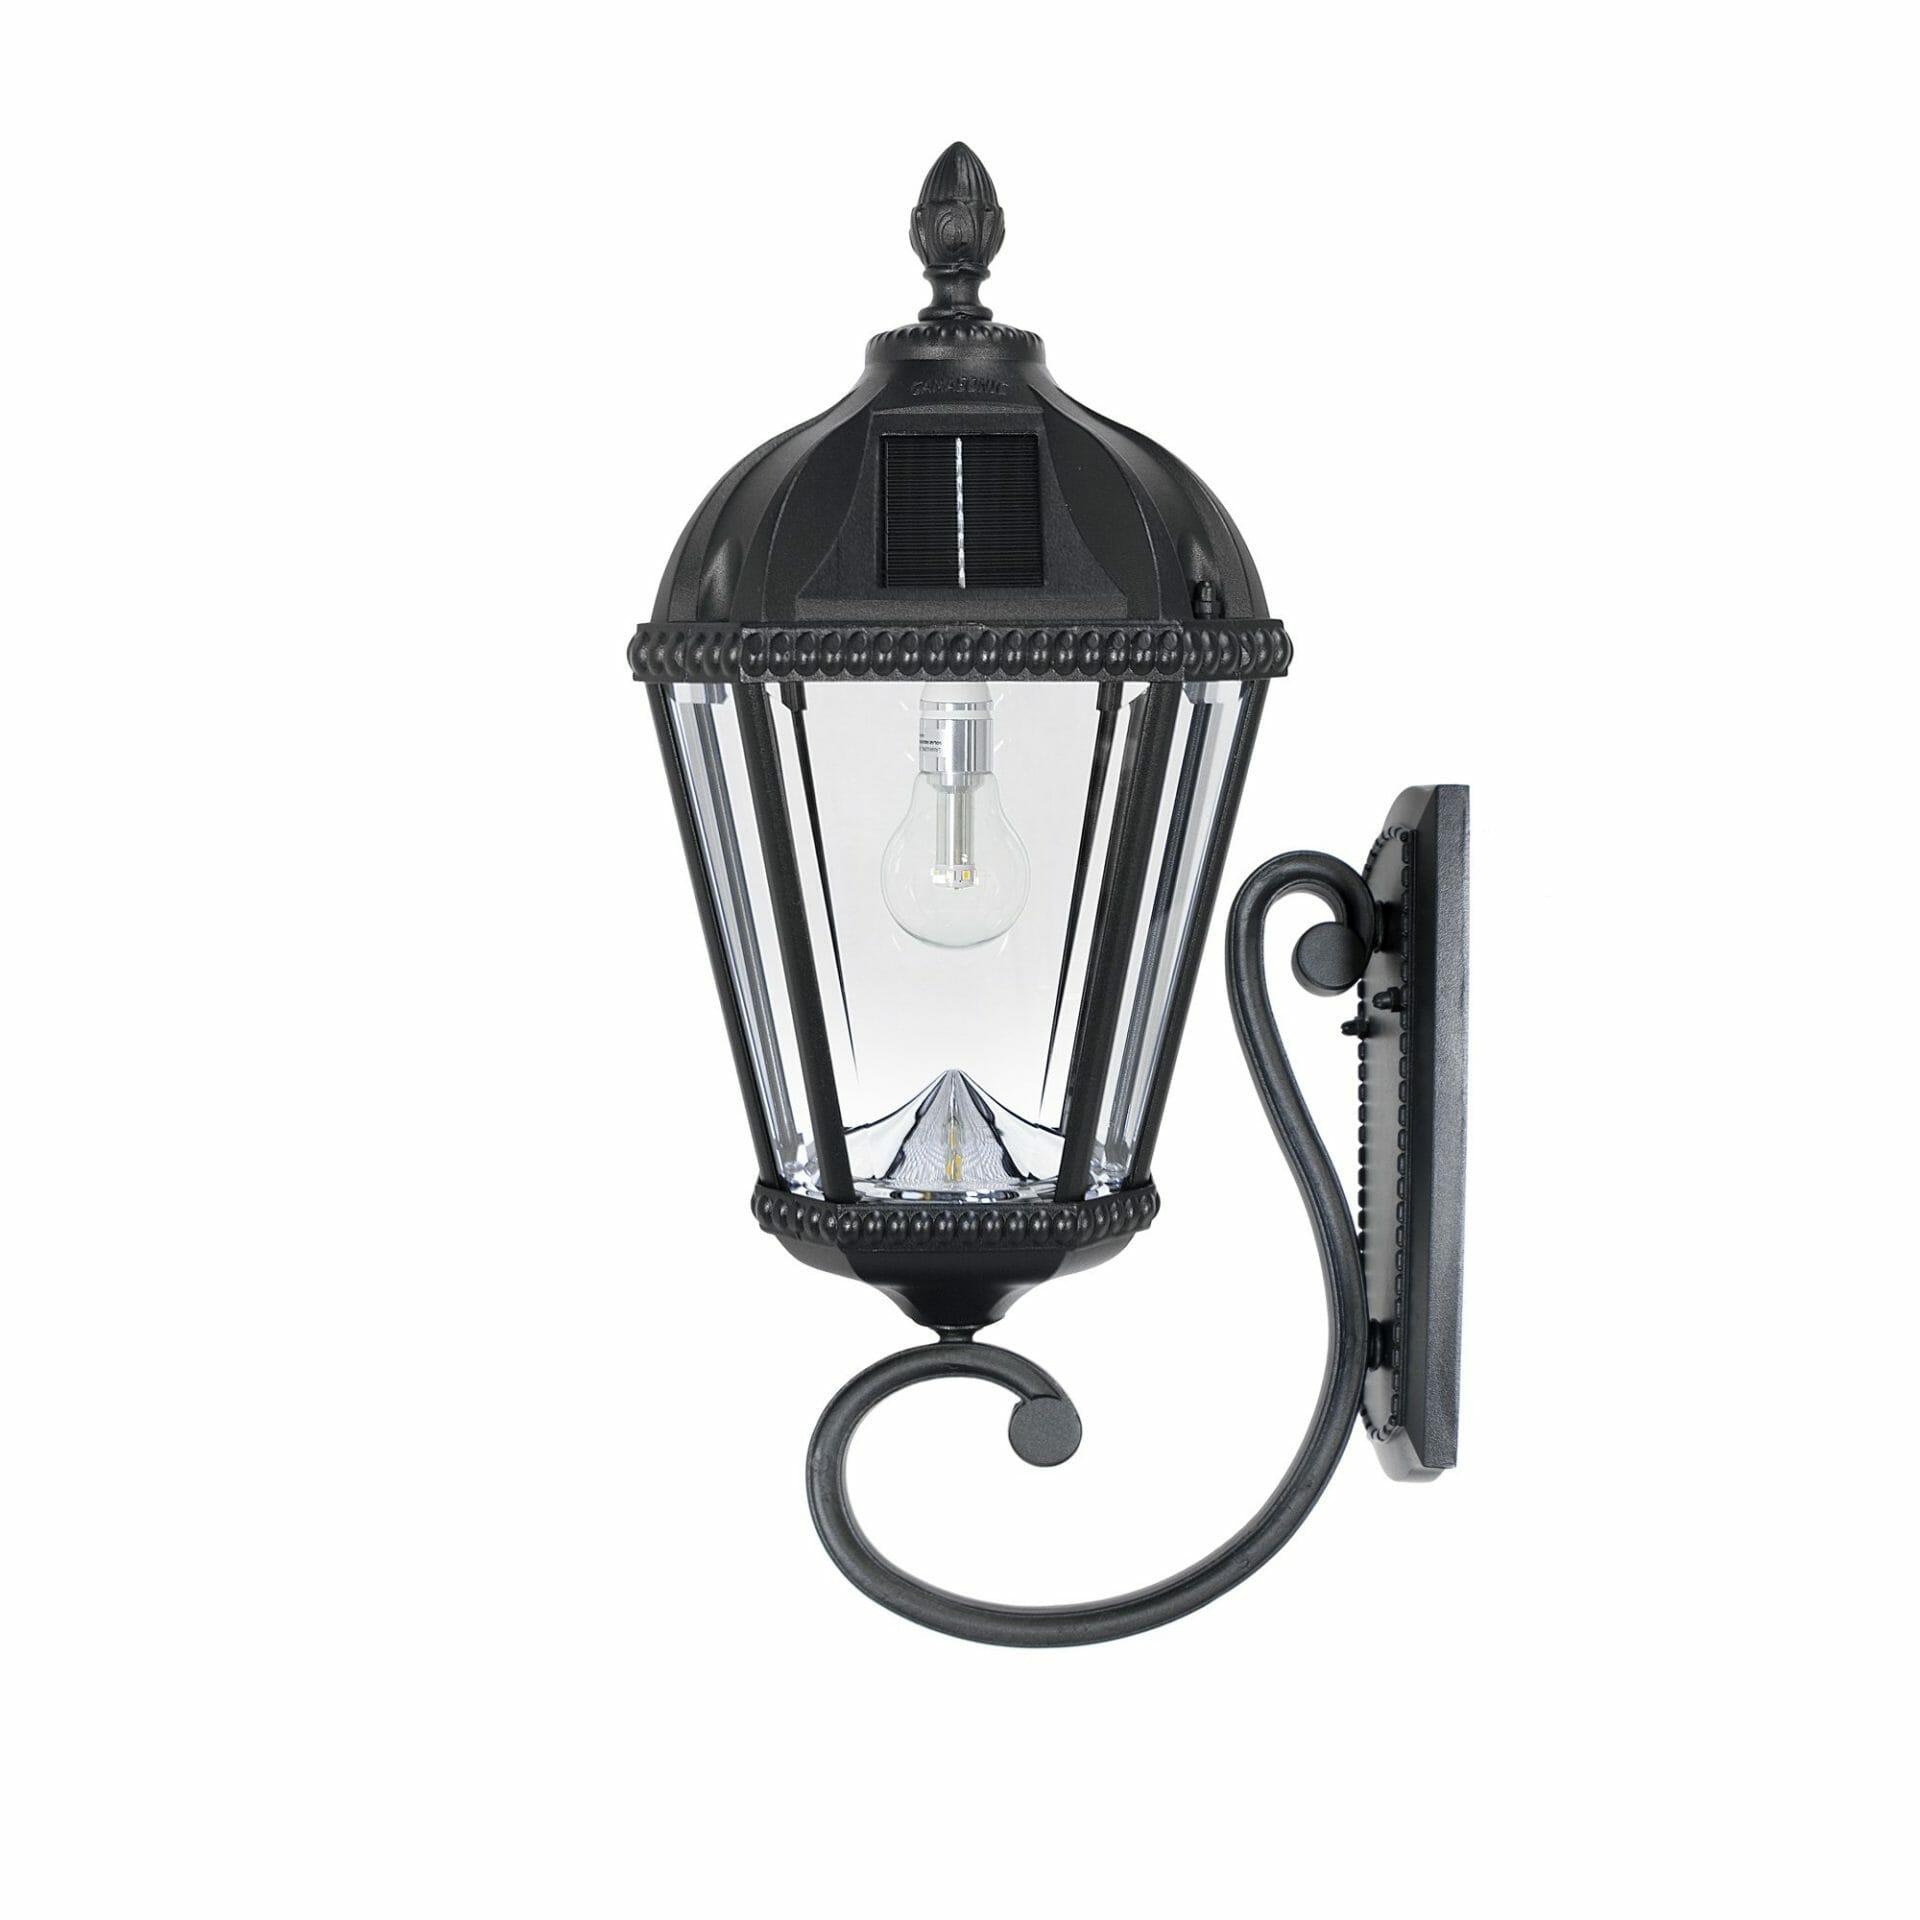 Royal Bulb Wall Mount Solar Lamp - Black